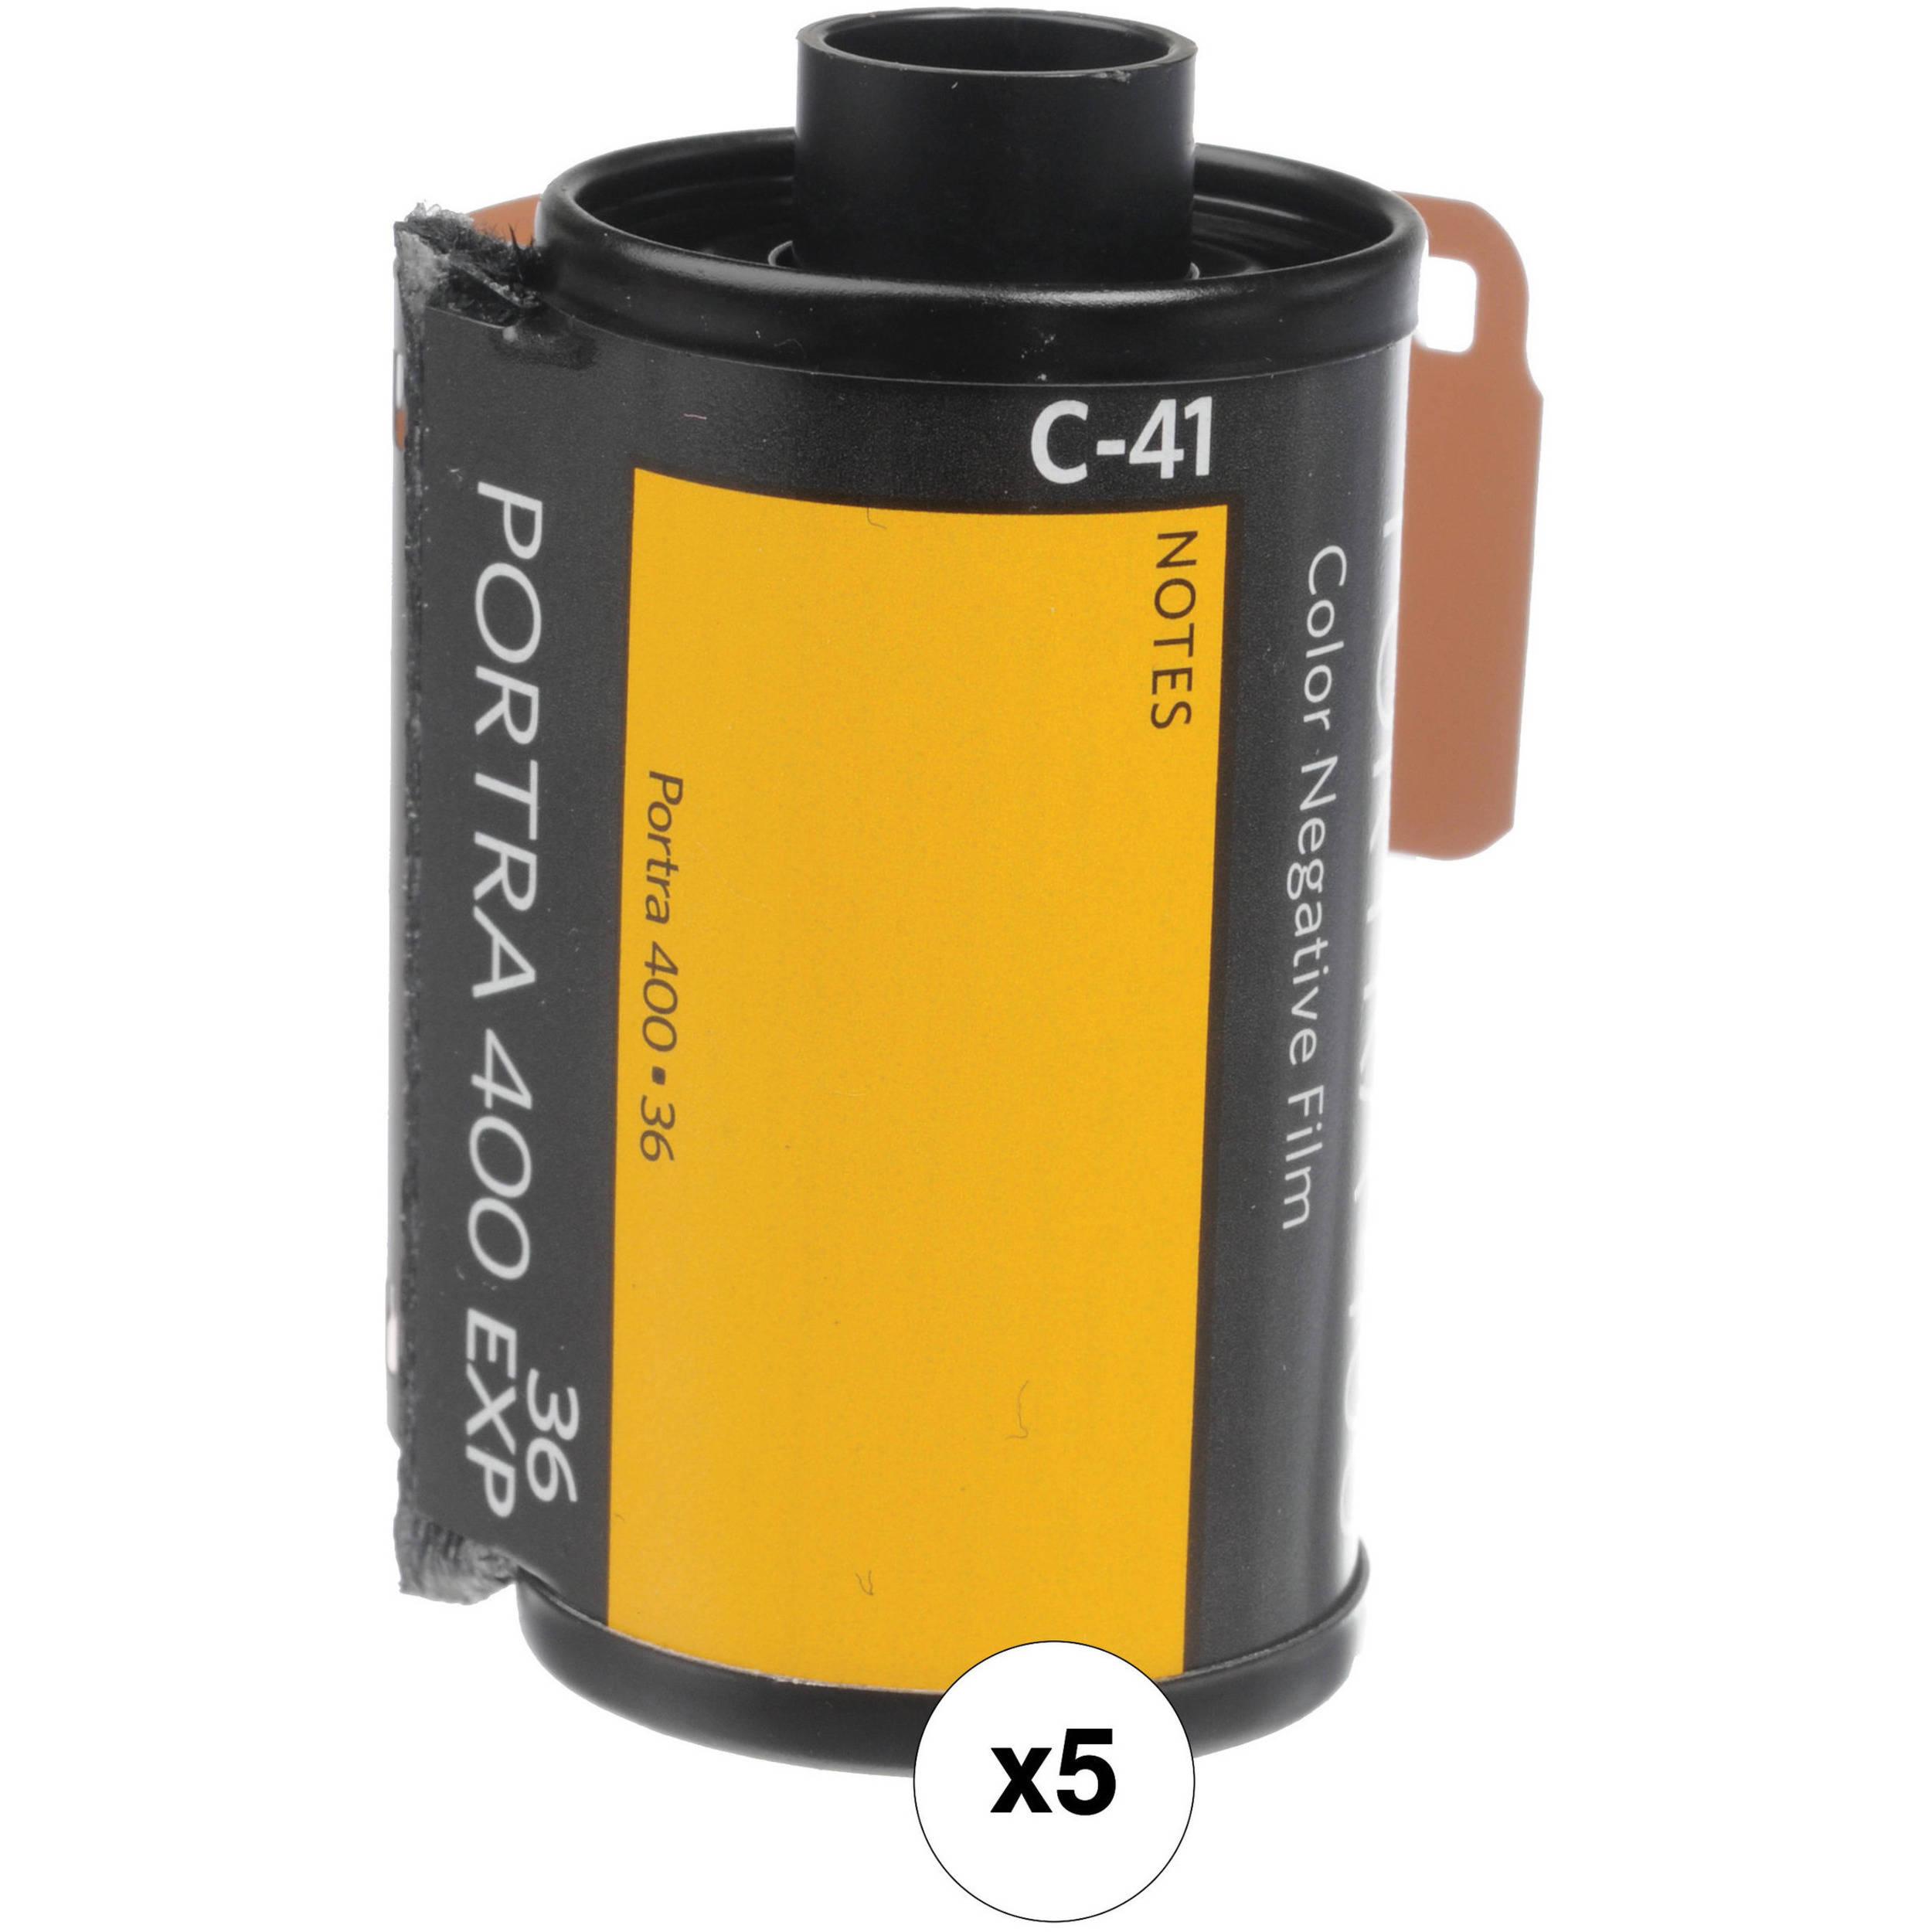 Kodak Professional Portra 400 Color Negative Film 6031678 B&H